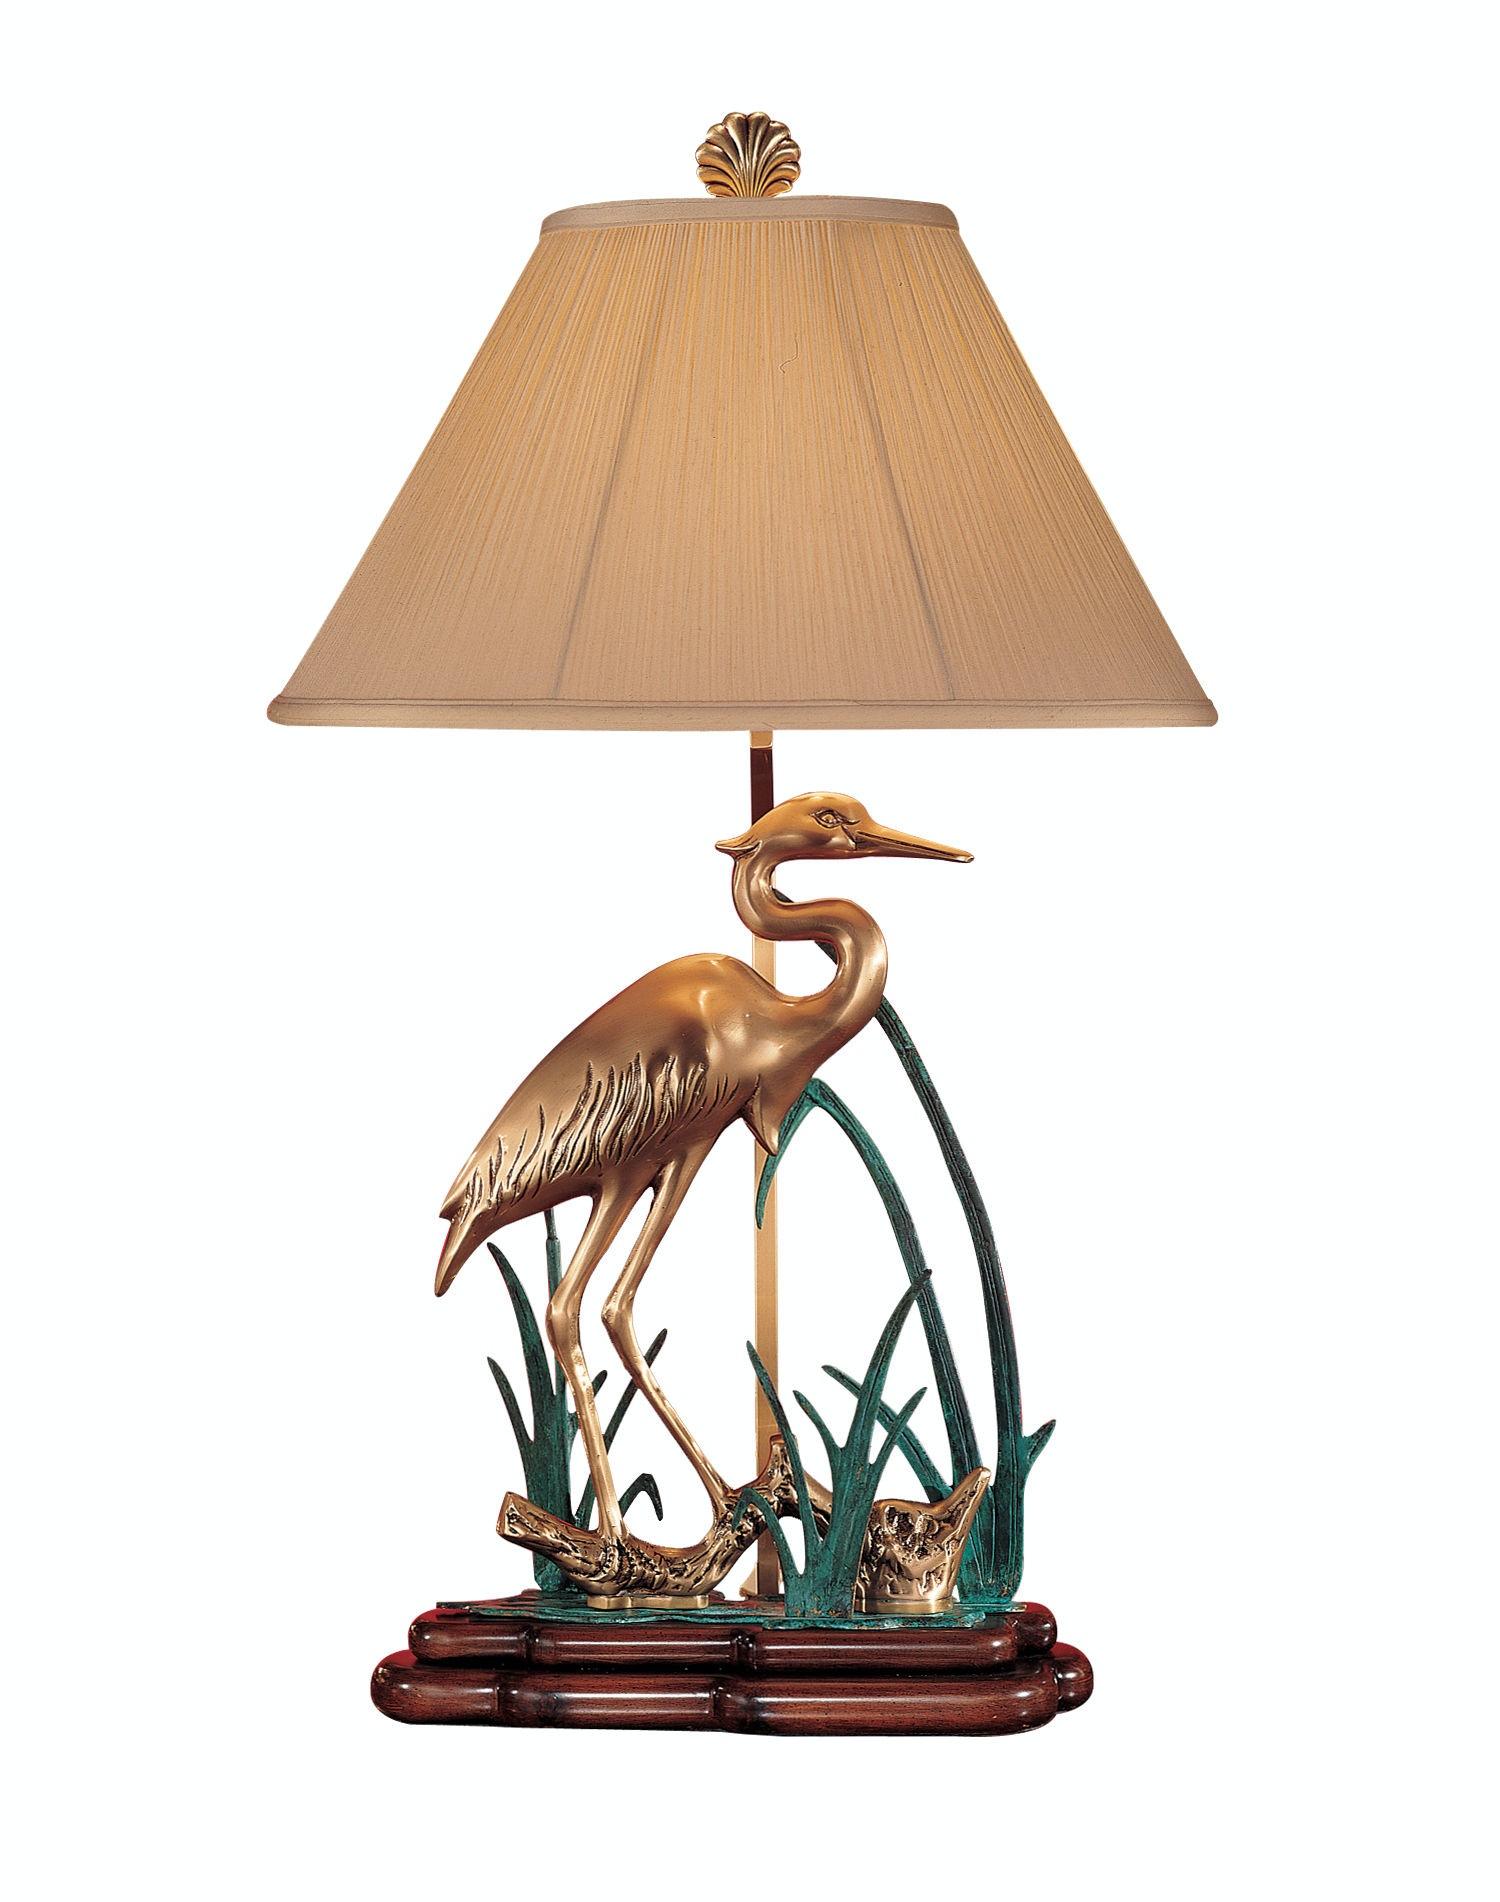 Greatest Wildwood Lamps Furniture - Giorgi Brothers - South San Francisco, CA FE18